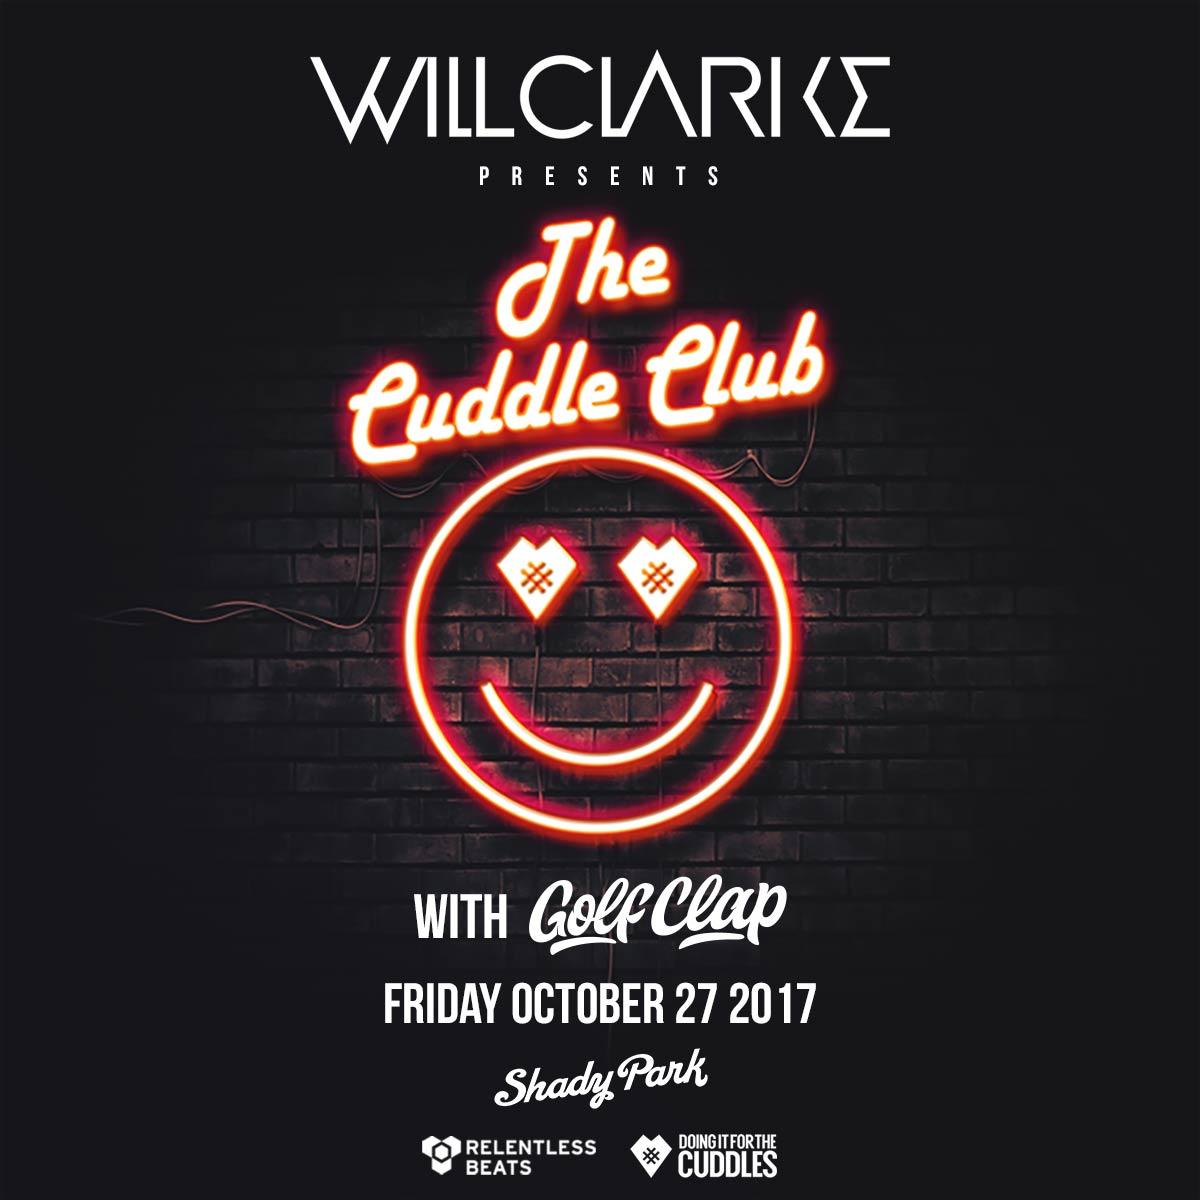 RT @RelentlessBeats #ShowAnnounce - @djwillclarke's Cuddle Club comes thru #Tempe w/ @golfclapdet on 10/27! Tix: https://t.co/8lawm2aB7x